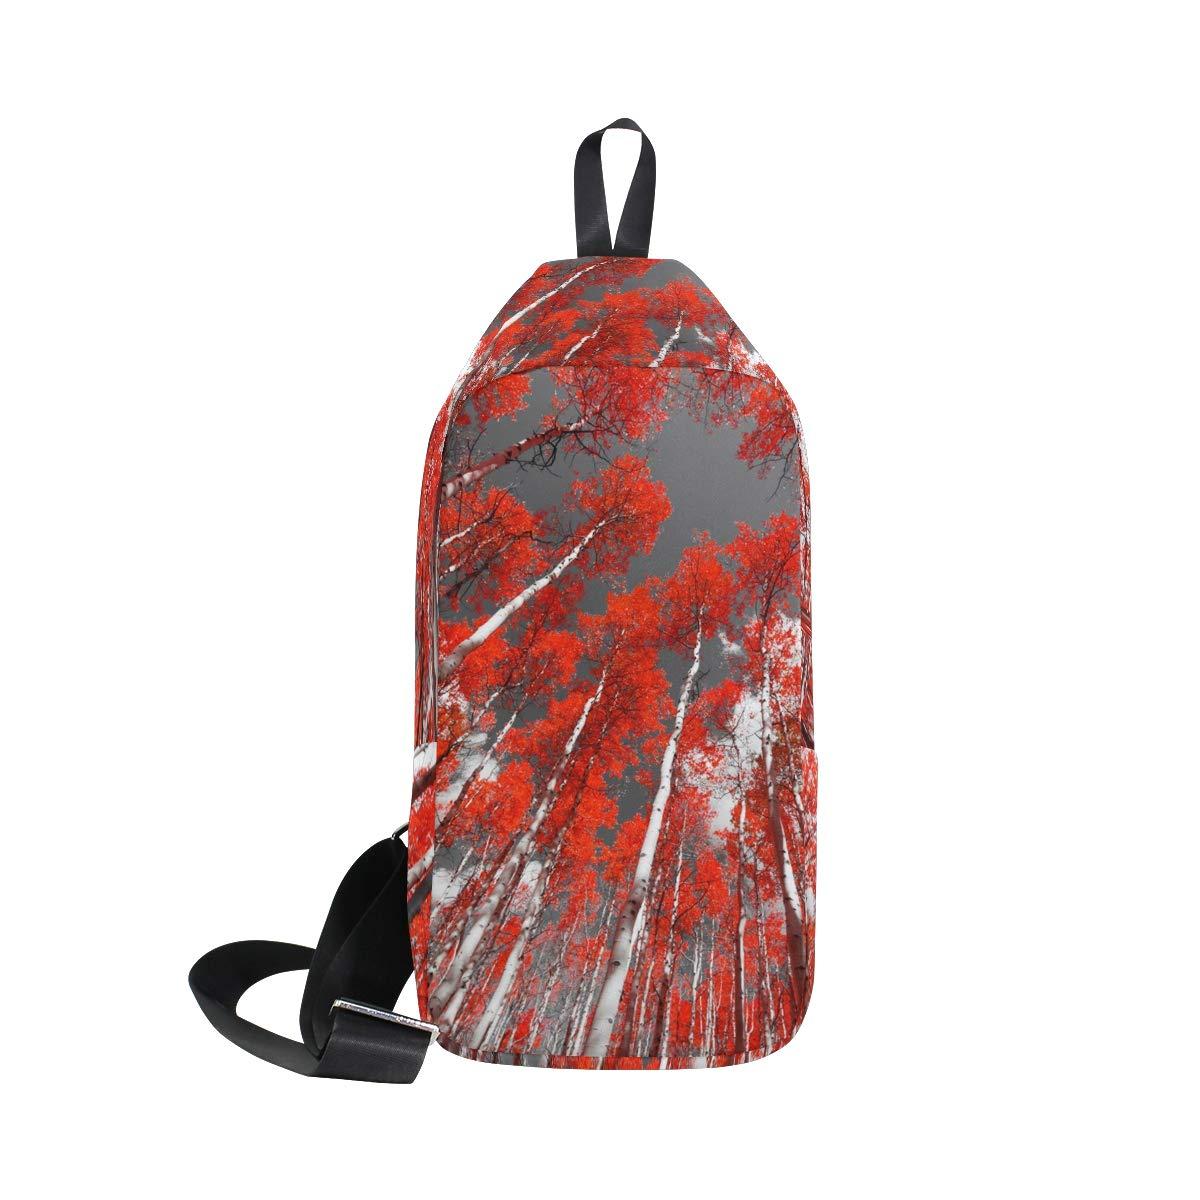 Unisex Messenger Bag Mangrove Forest Sky Shoulder Chest Cross Body Backpack Bag